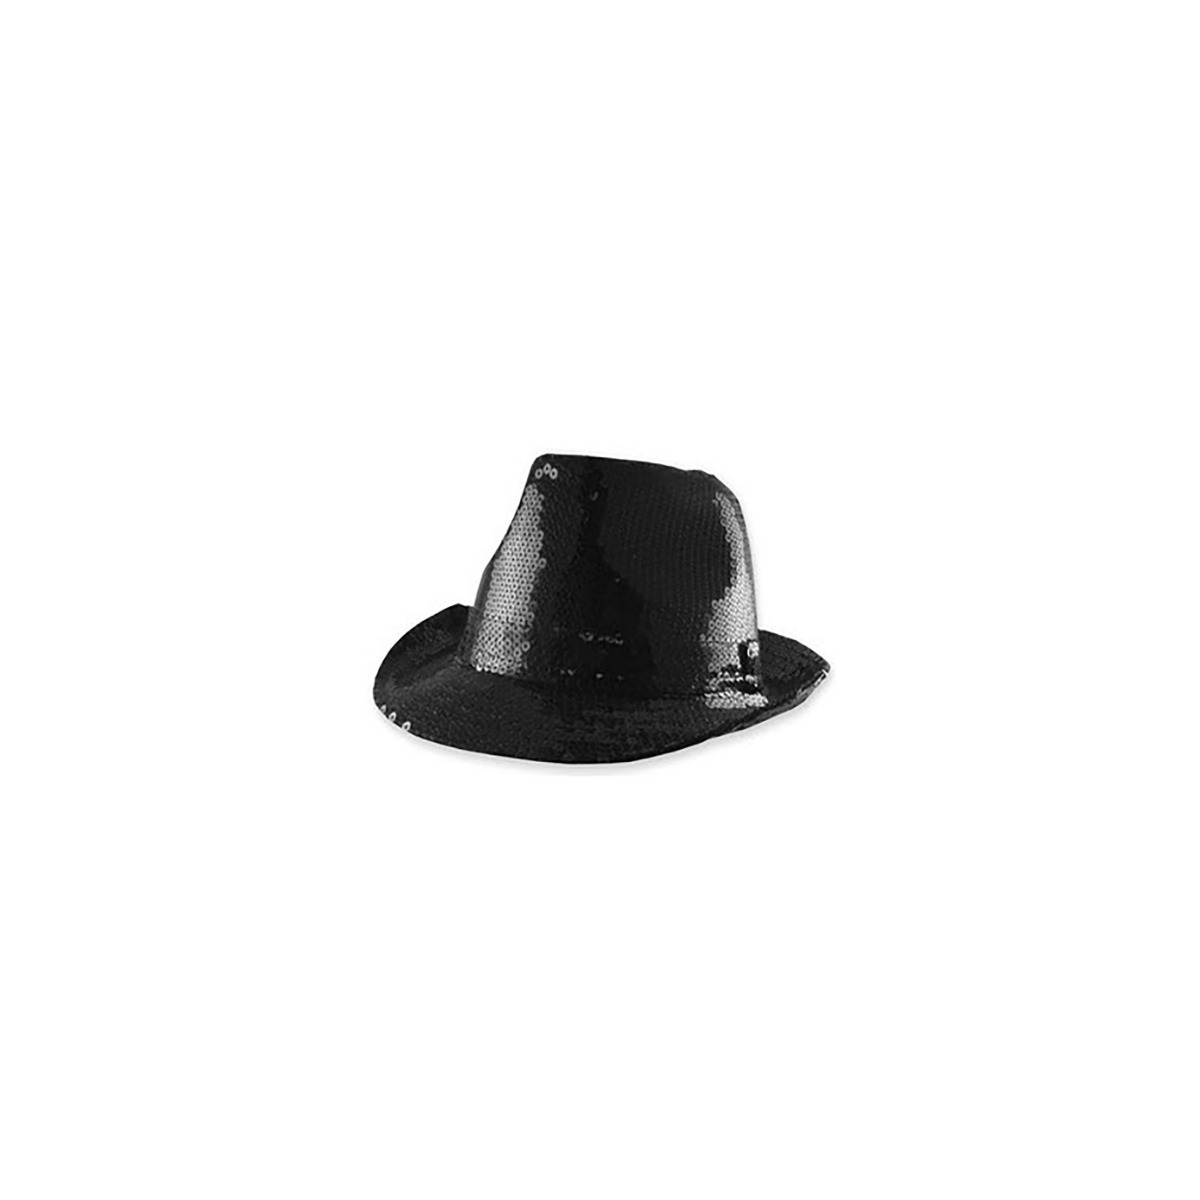 f2f780f0fafa6 sombrero lentejuelas tipo tango -unisex - fedora. Cargando zoom.